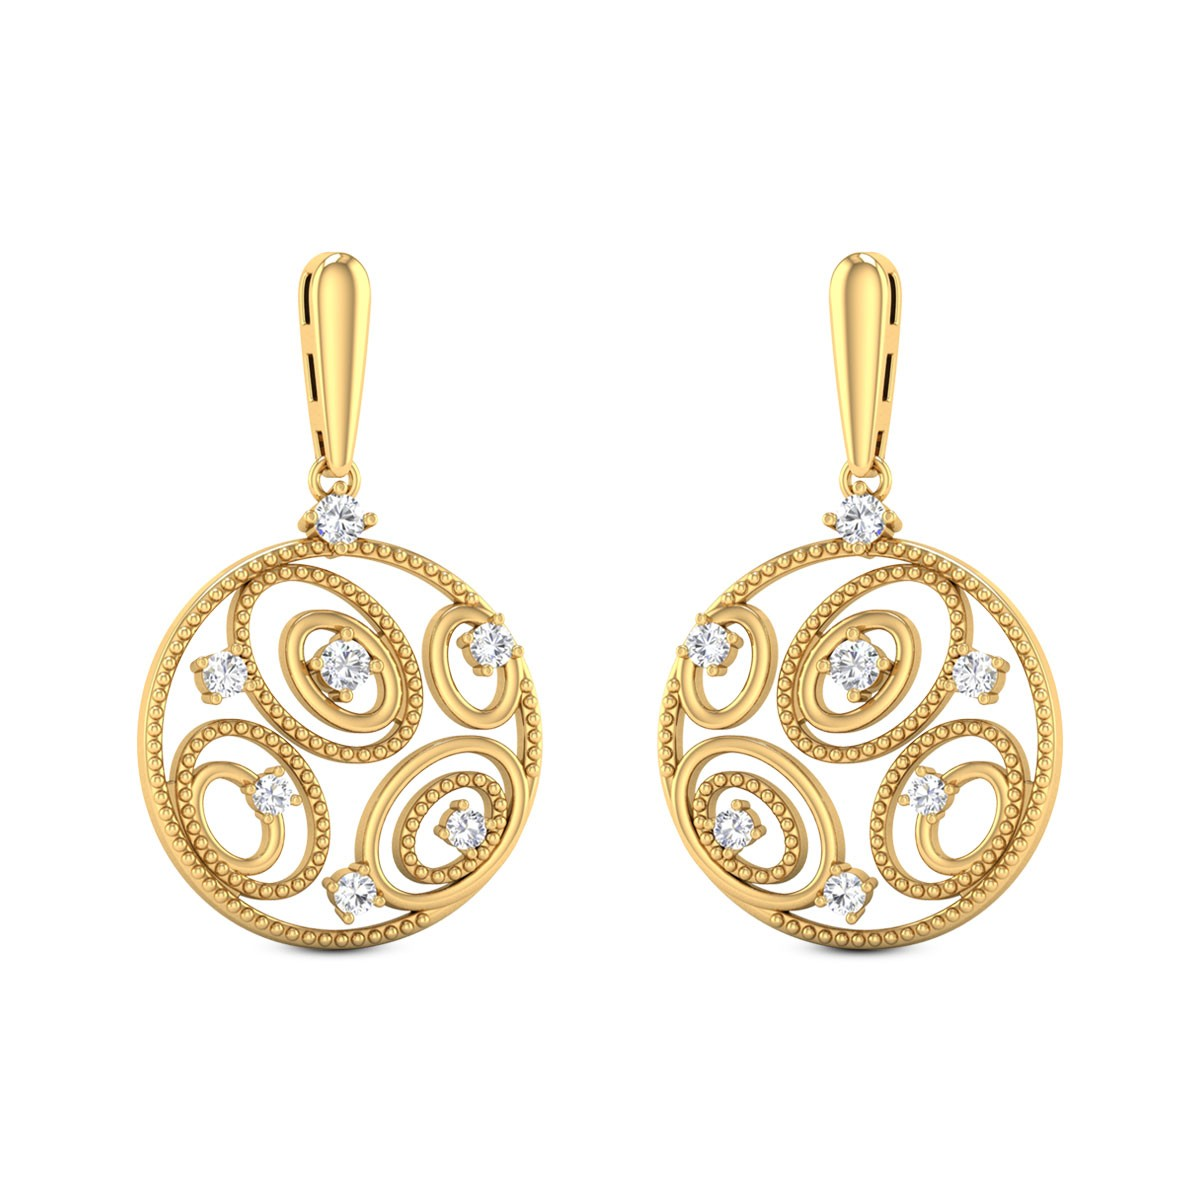 Mystic Muse Diamond Earrings